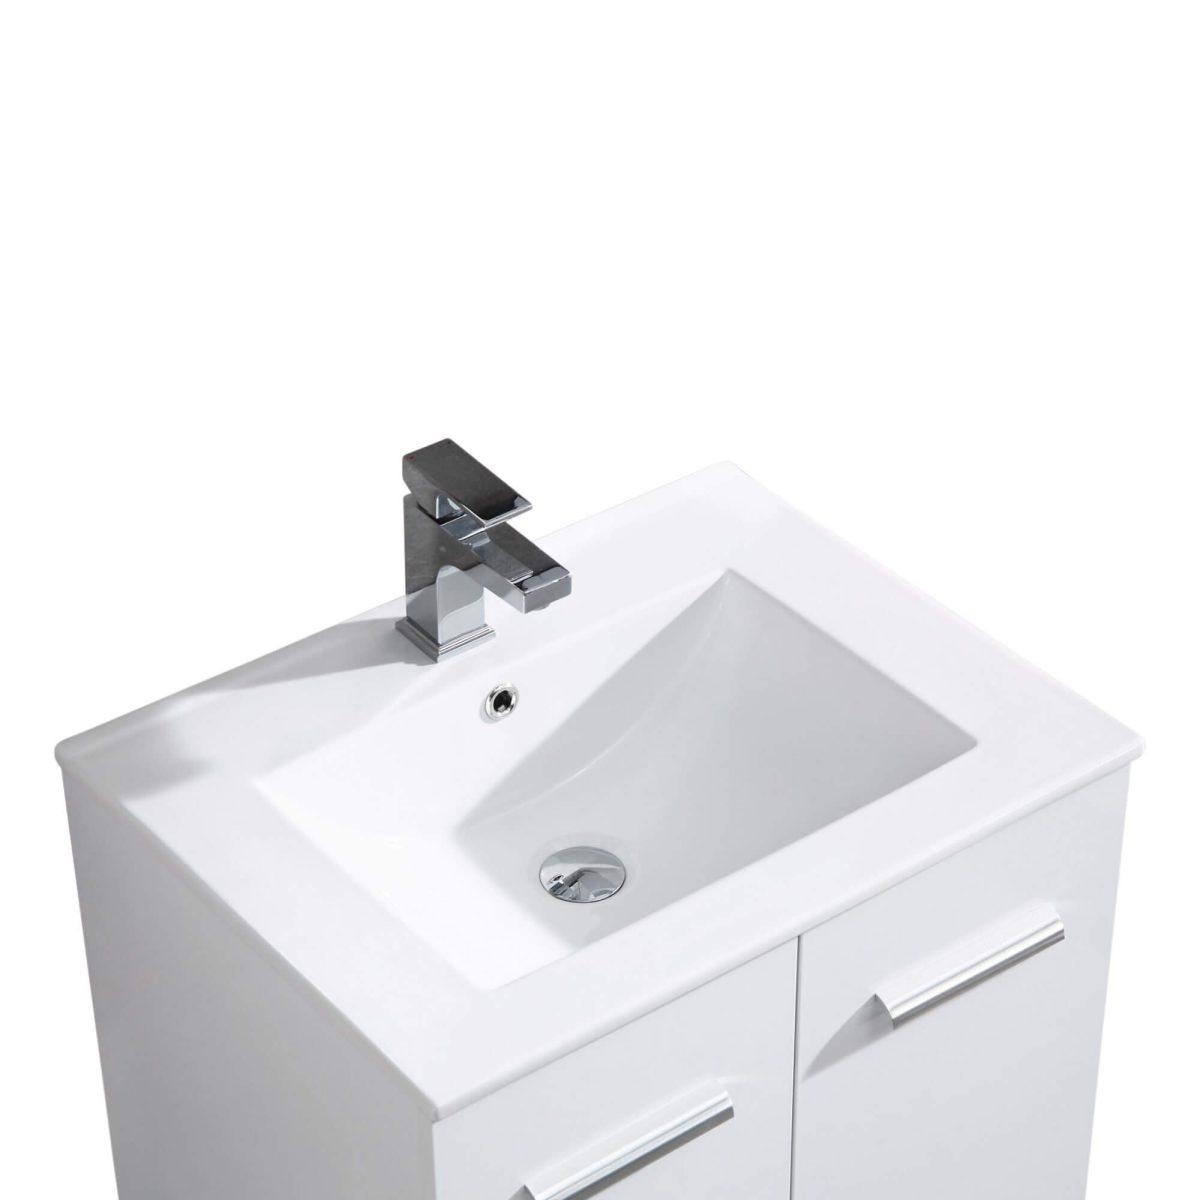 "Atwood 24"" Modern Bathroom Vanity,White"